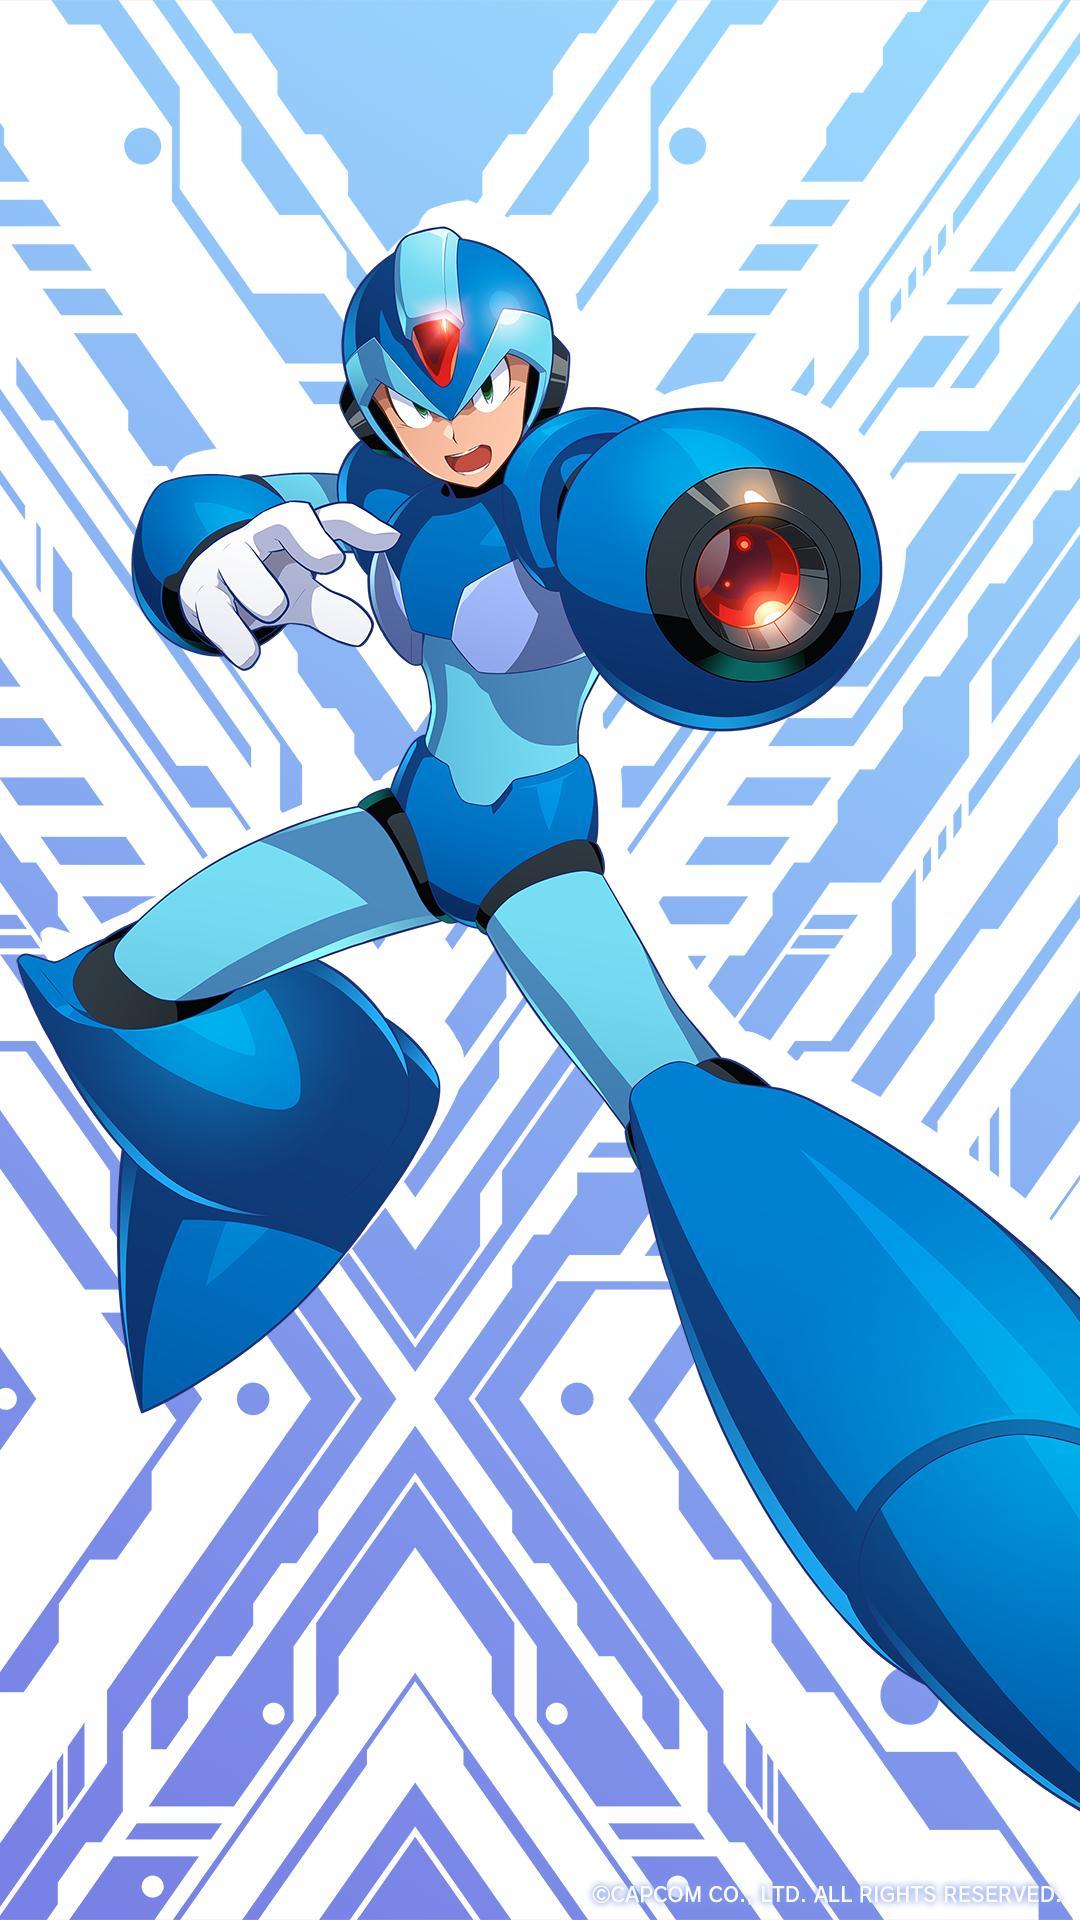 Mega Man X (character)